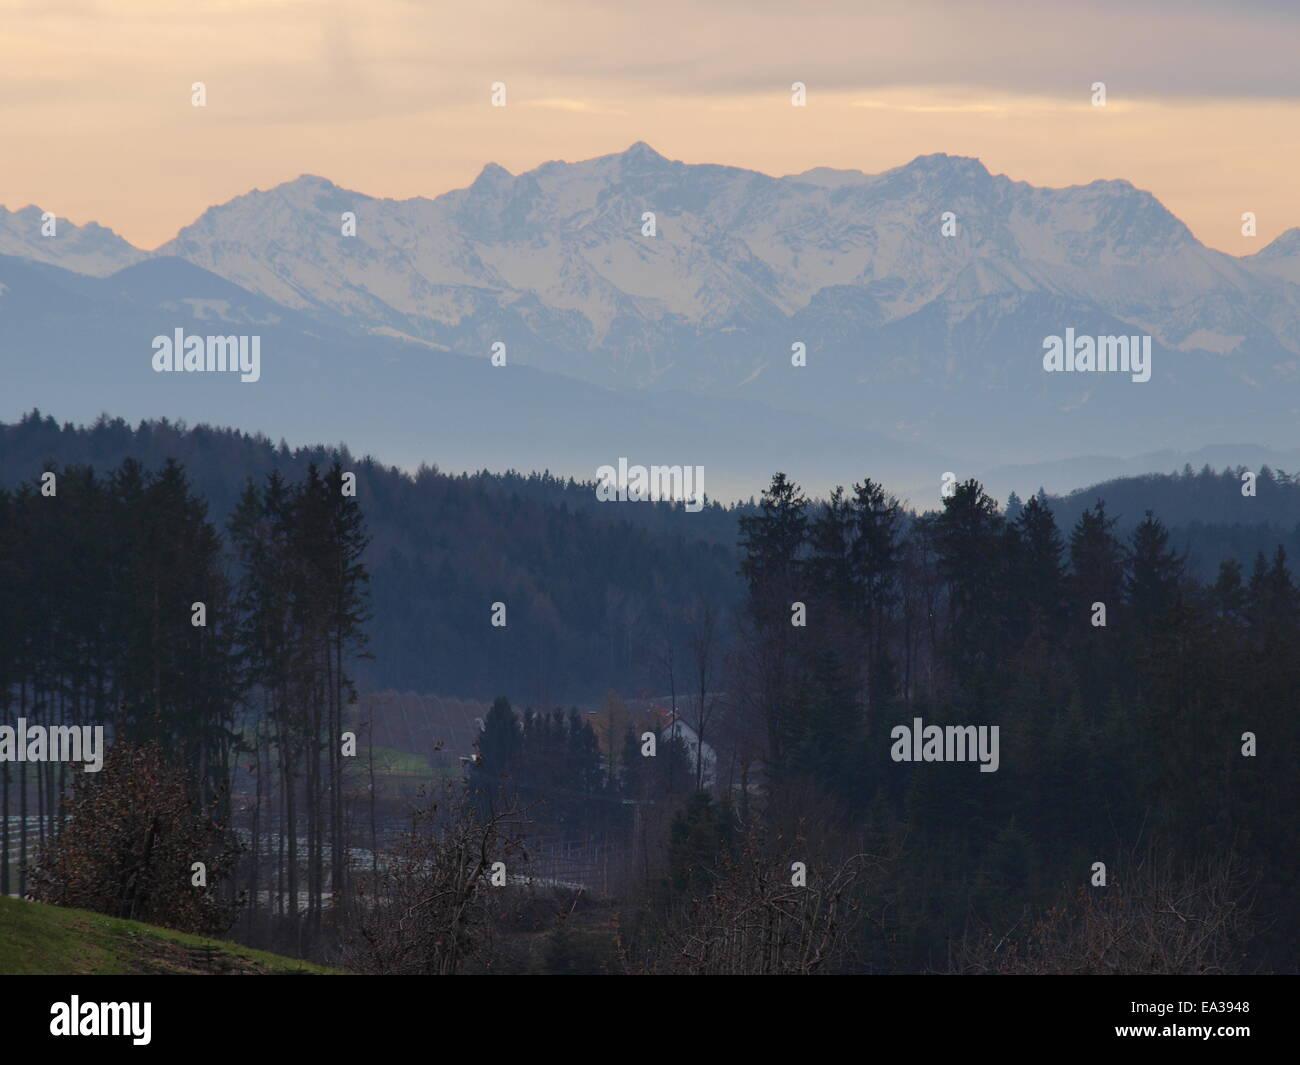 Föhn am Bodensee, Blick auf die Alpen Stockbild